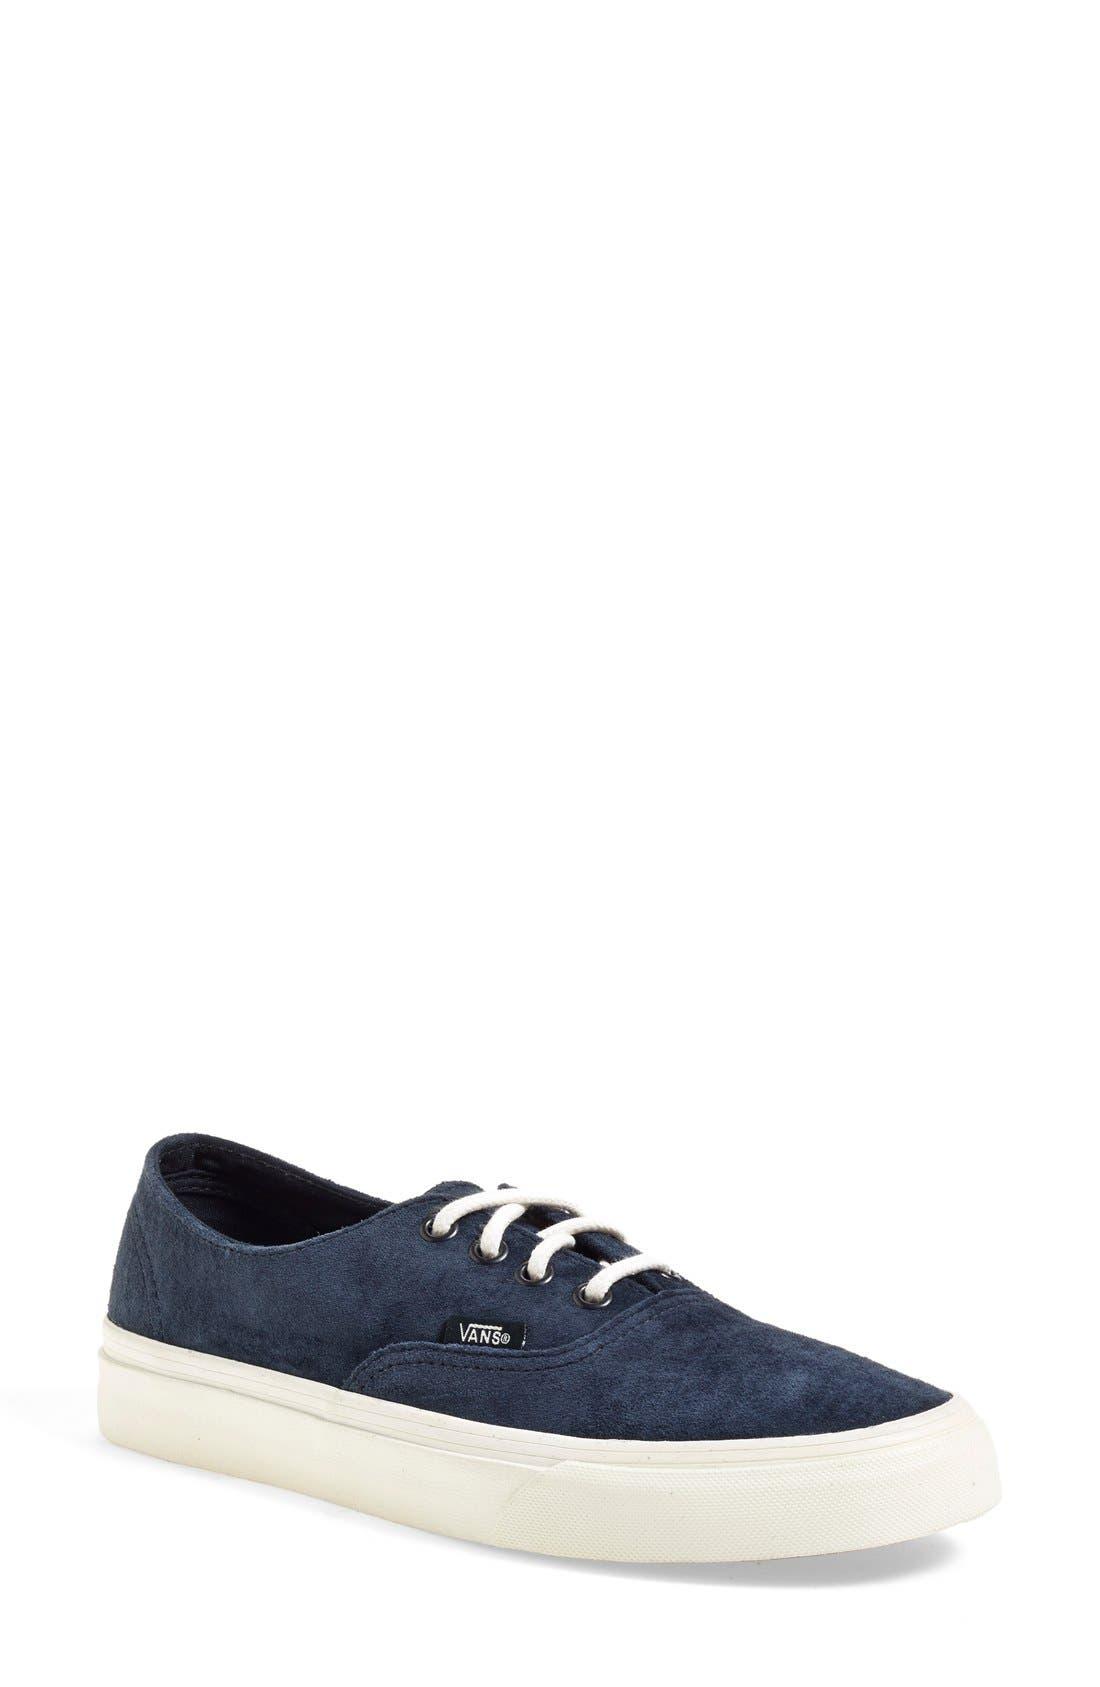 Main Image - Vans 'Authentic - Era Decon CA' Sneaker (Women)